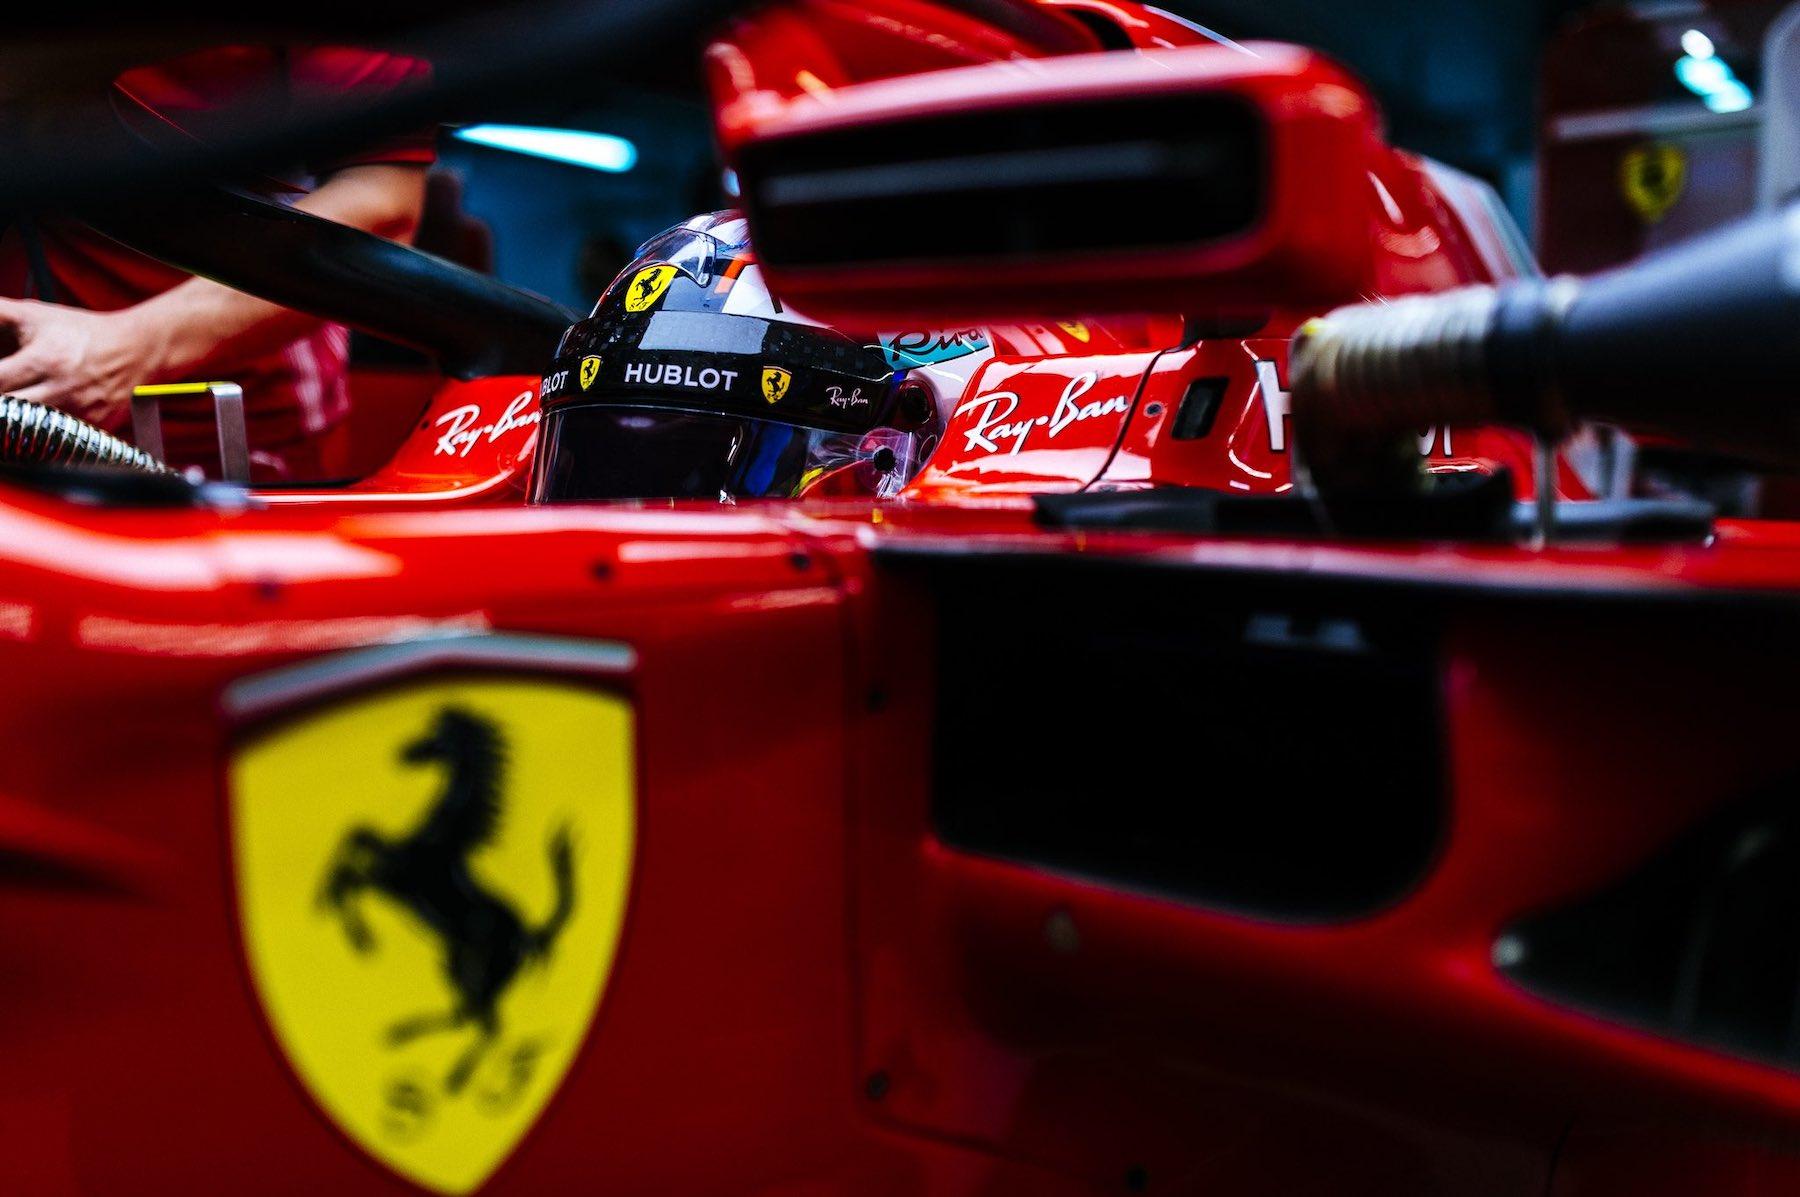 2018 Kimi Raikkonen | Ferrari SF71H | 2018 Russian GP Q3 1 copy.jpg